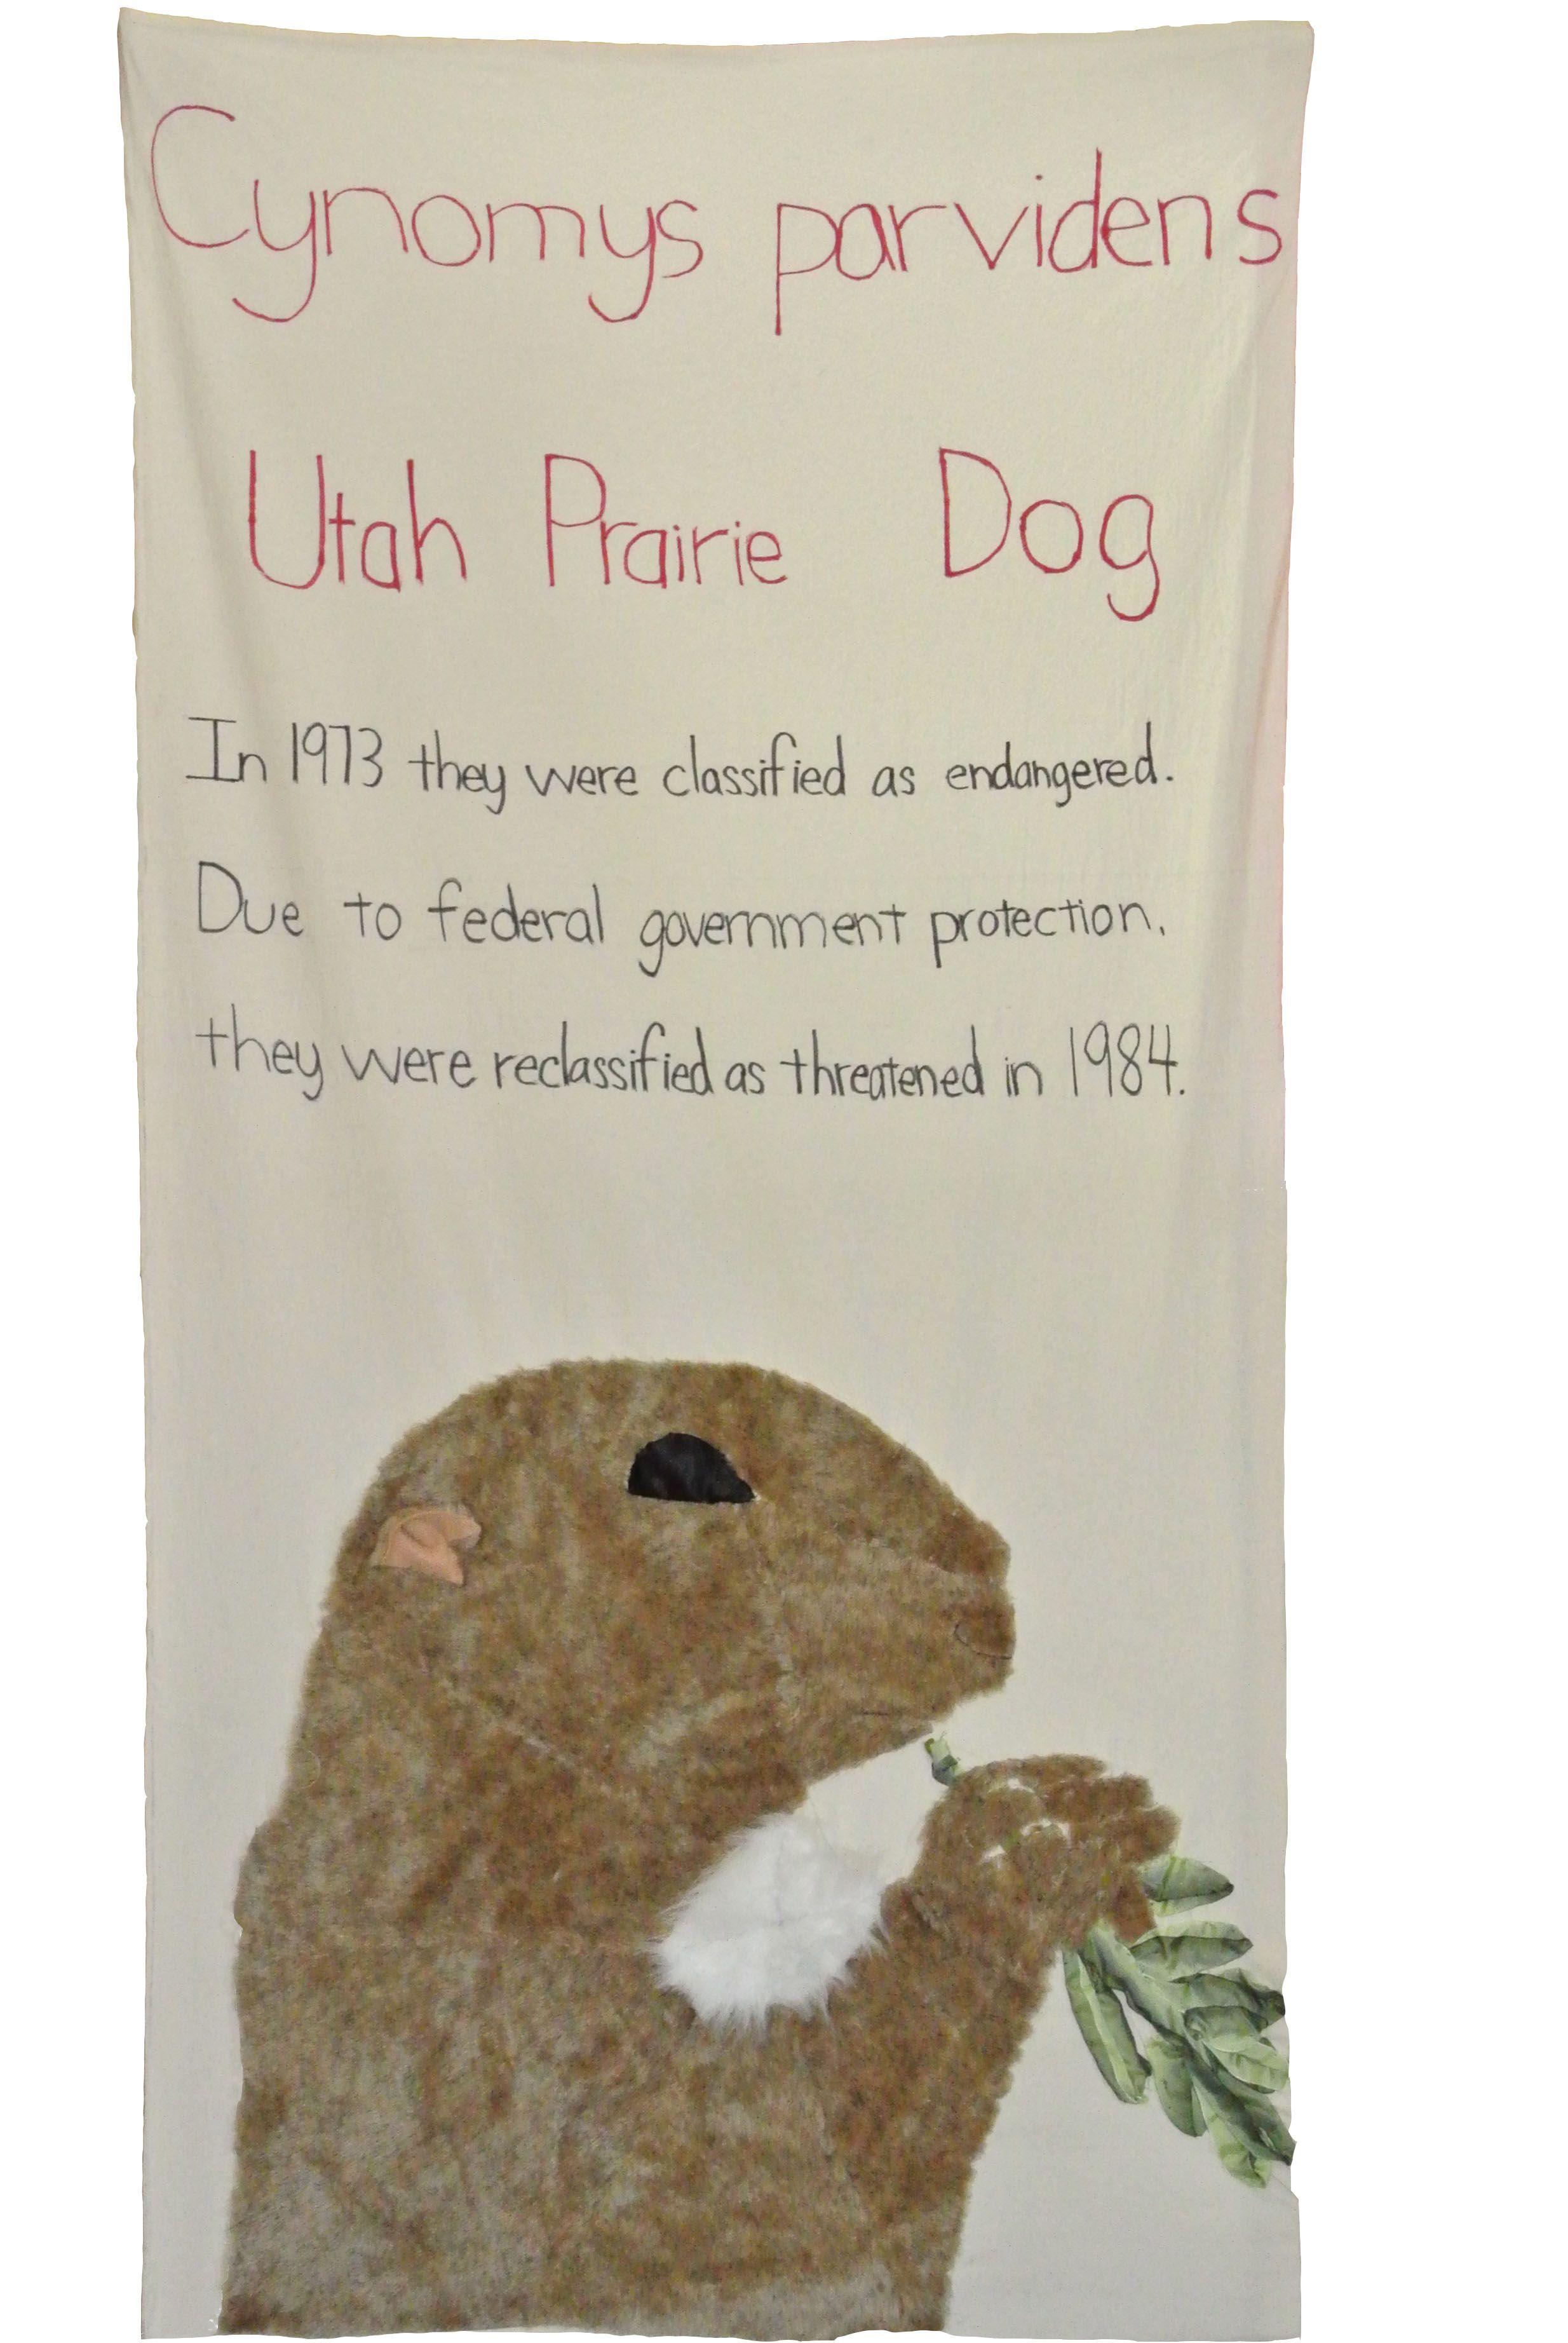 Utah Prairie Dog Panel Done By 6th Graders At Thomas Starr